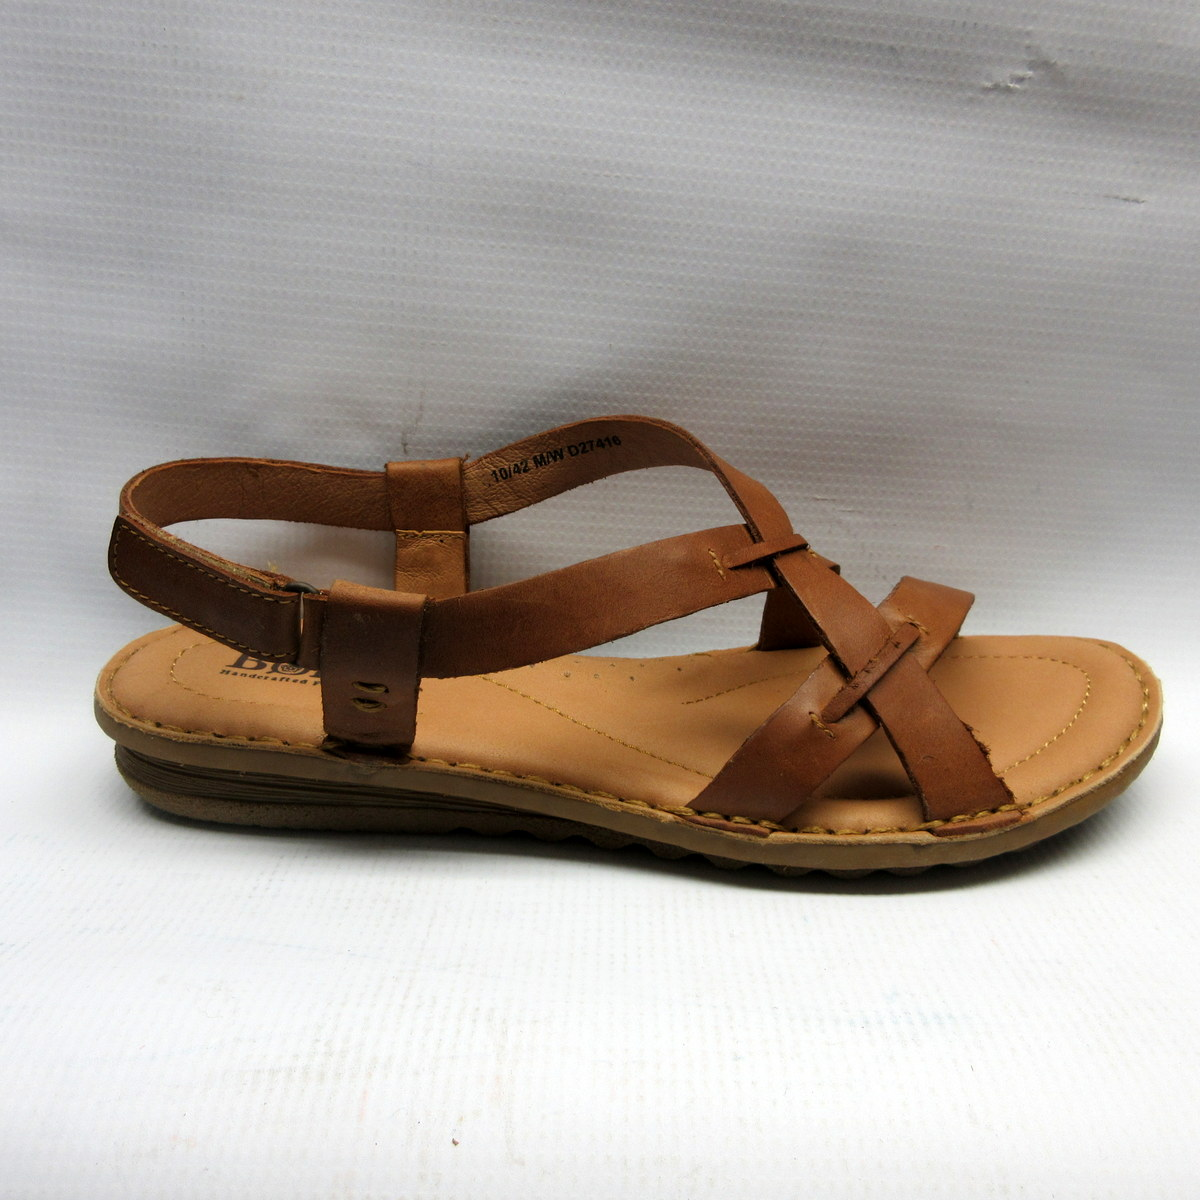 7ecbe4b47 Born Sandals Women Rainey In Tan Size 10 Cabaline